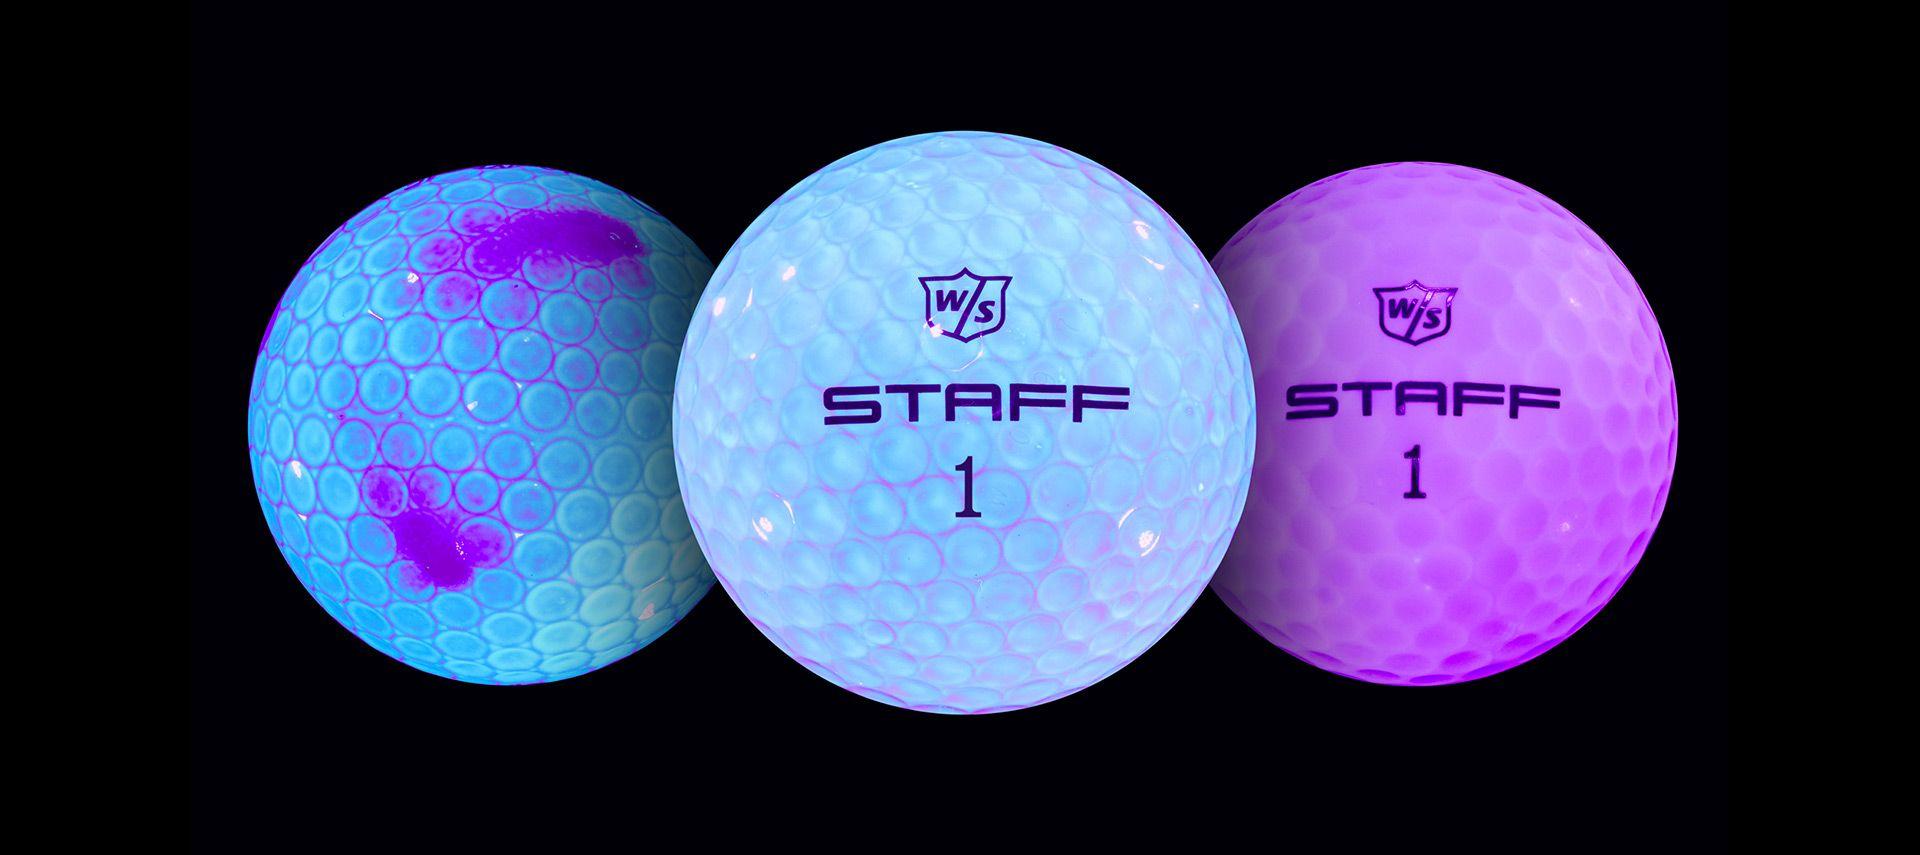 raw golf balls under black light